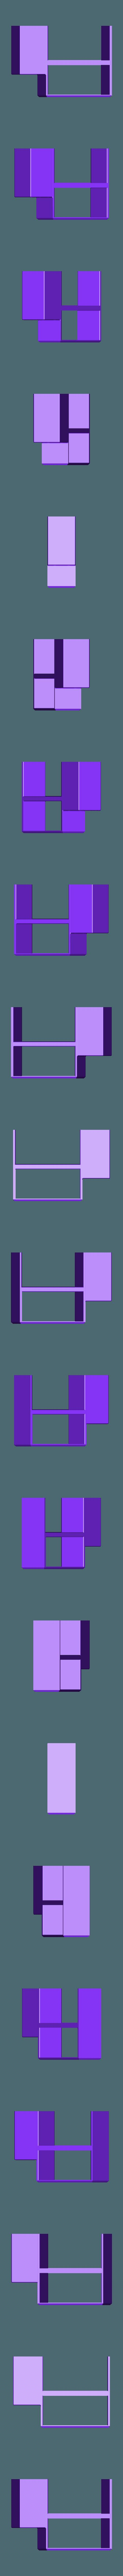 Tool Holder.stl Download STL file File/Tool , Xacto/Craft Knife Holder • 3D print template, jaxi666